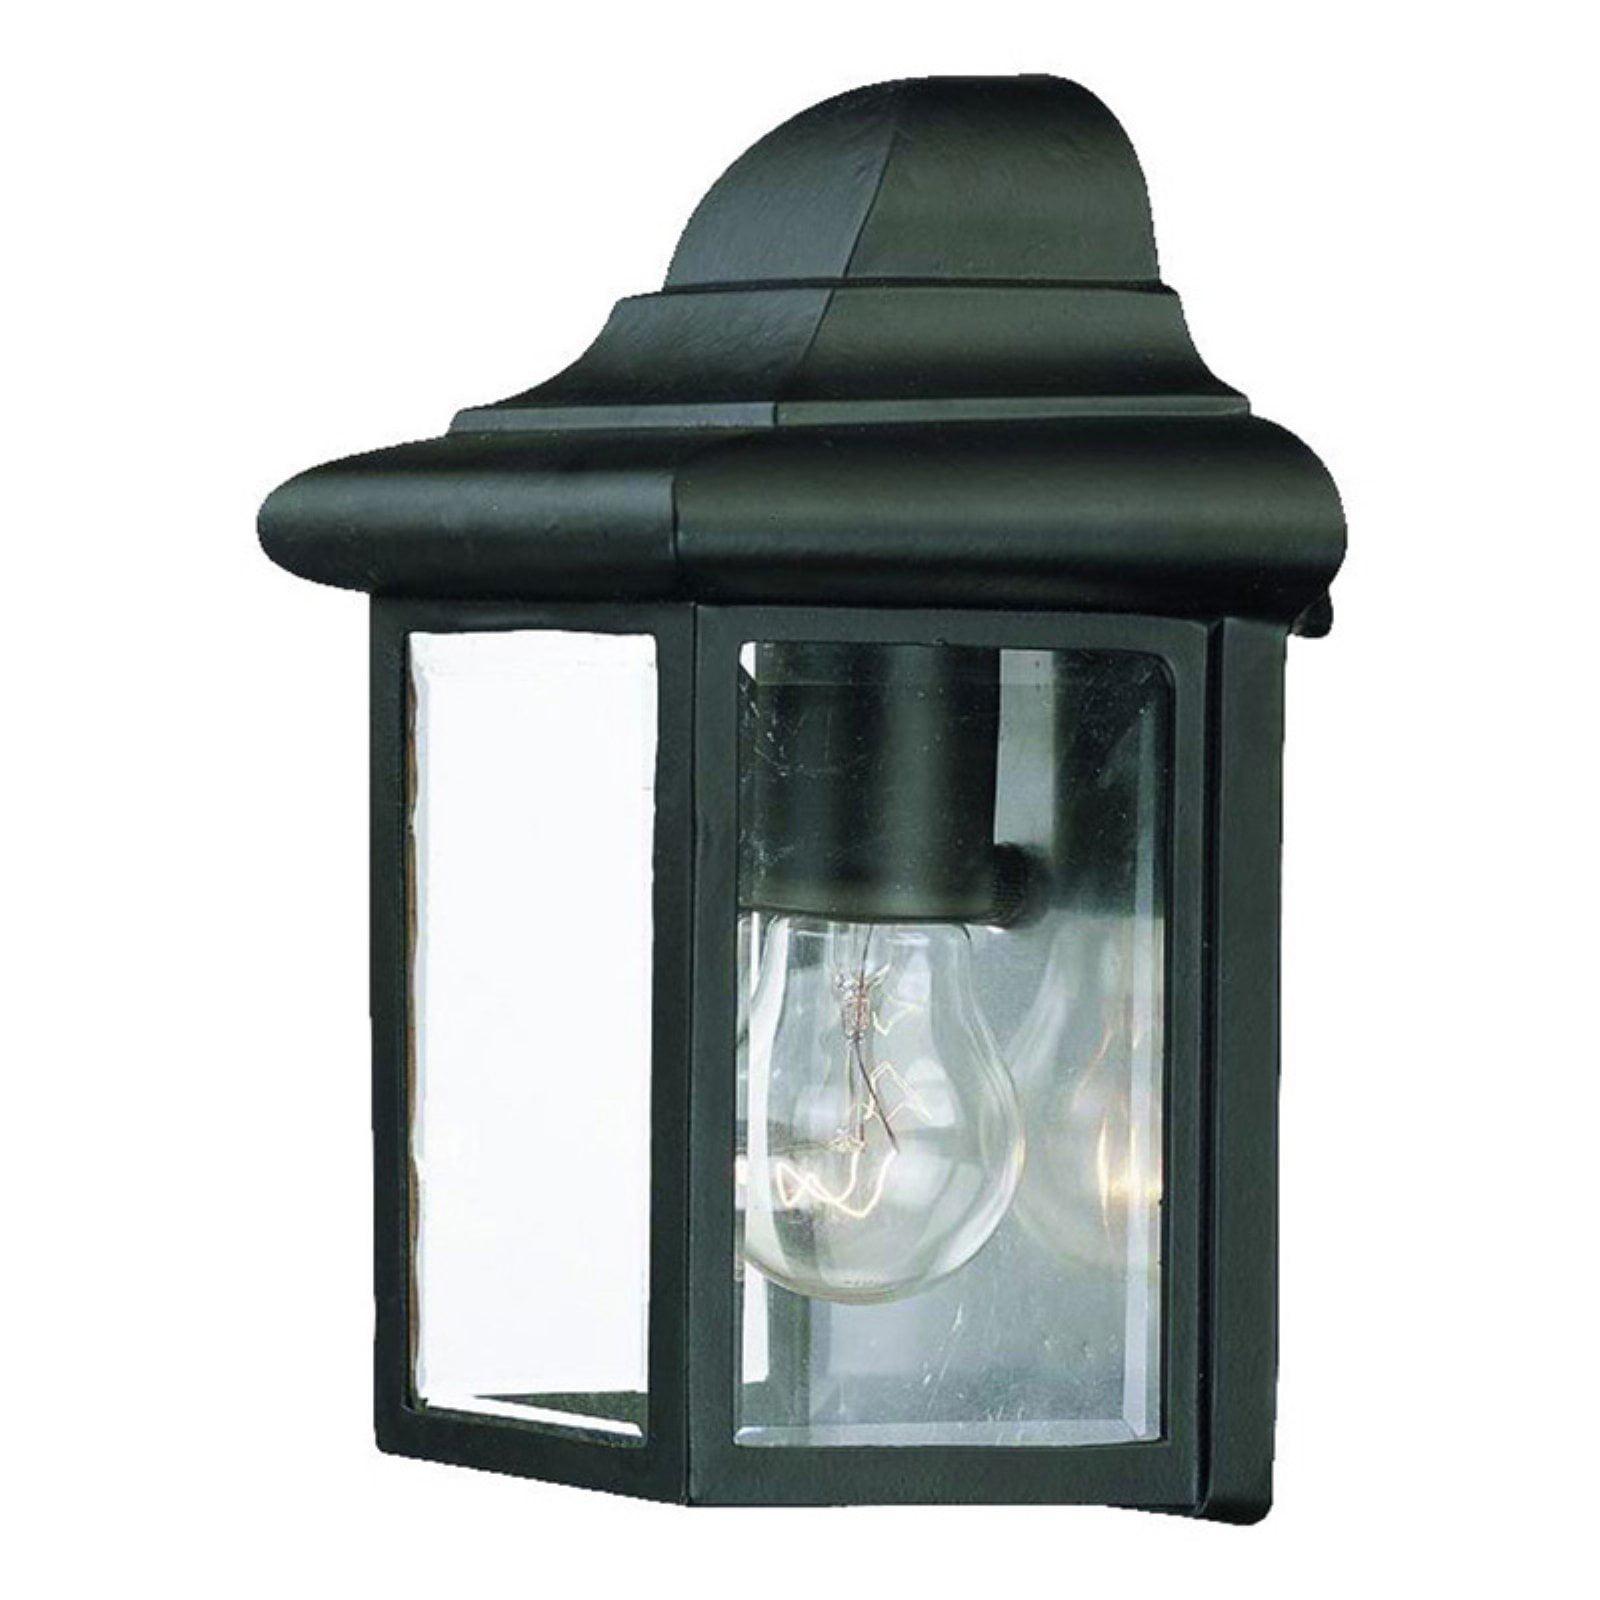 Acclaim Lighting Pocket Lantern Outdoor Wall Mount Light Fixture